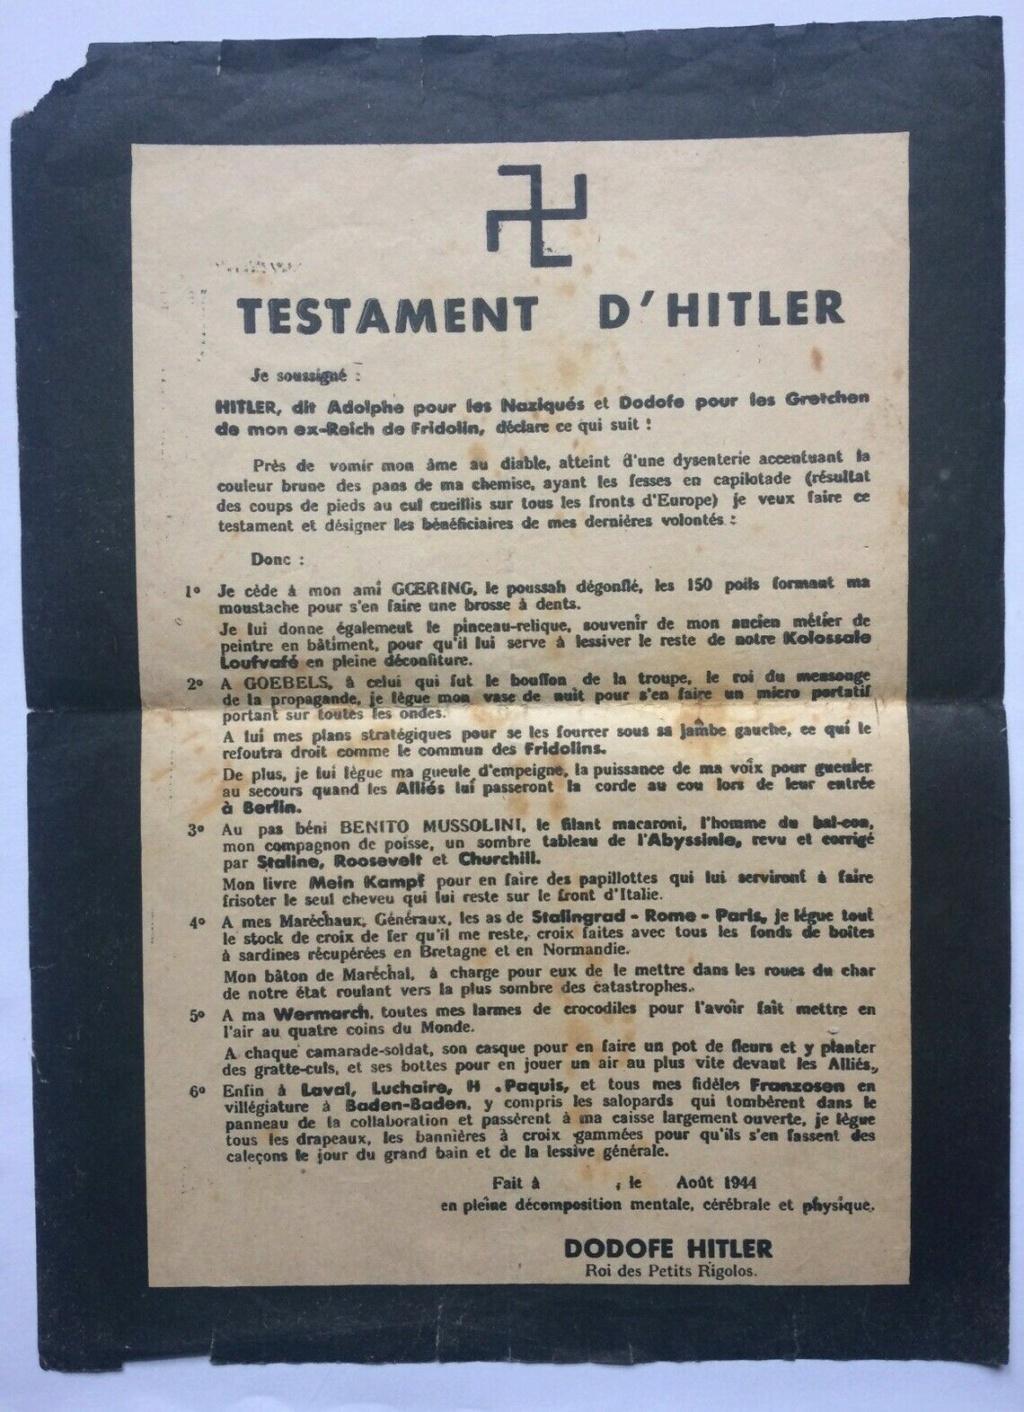 Tract de résistant (testament hitler) S-l16141